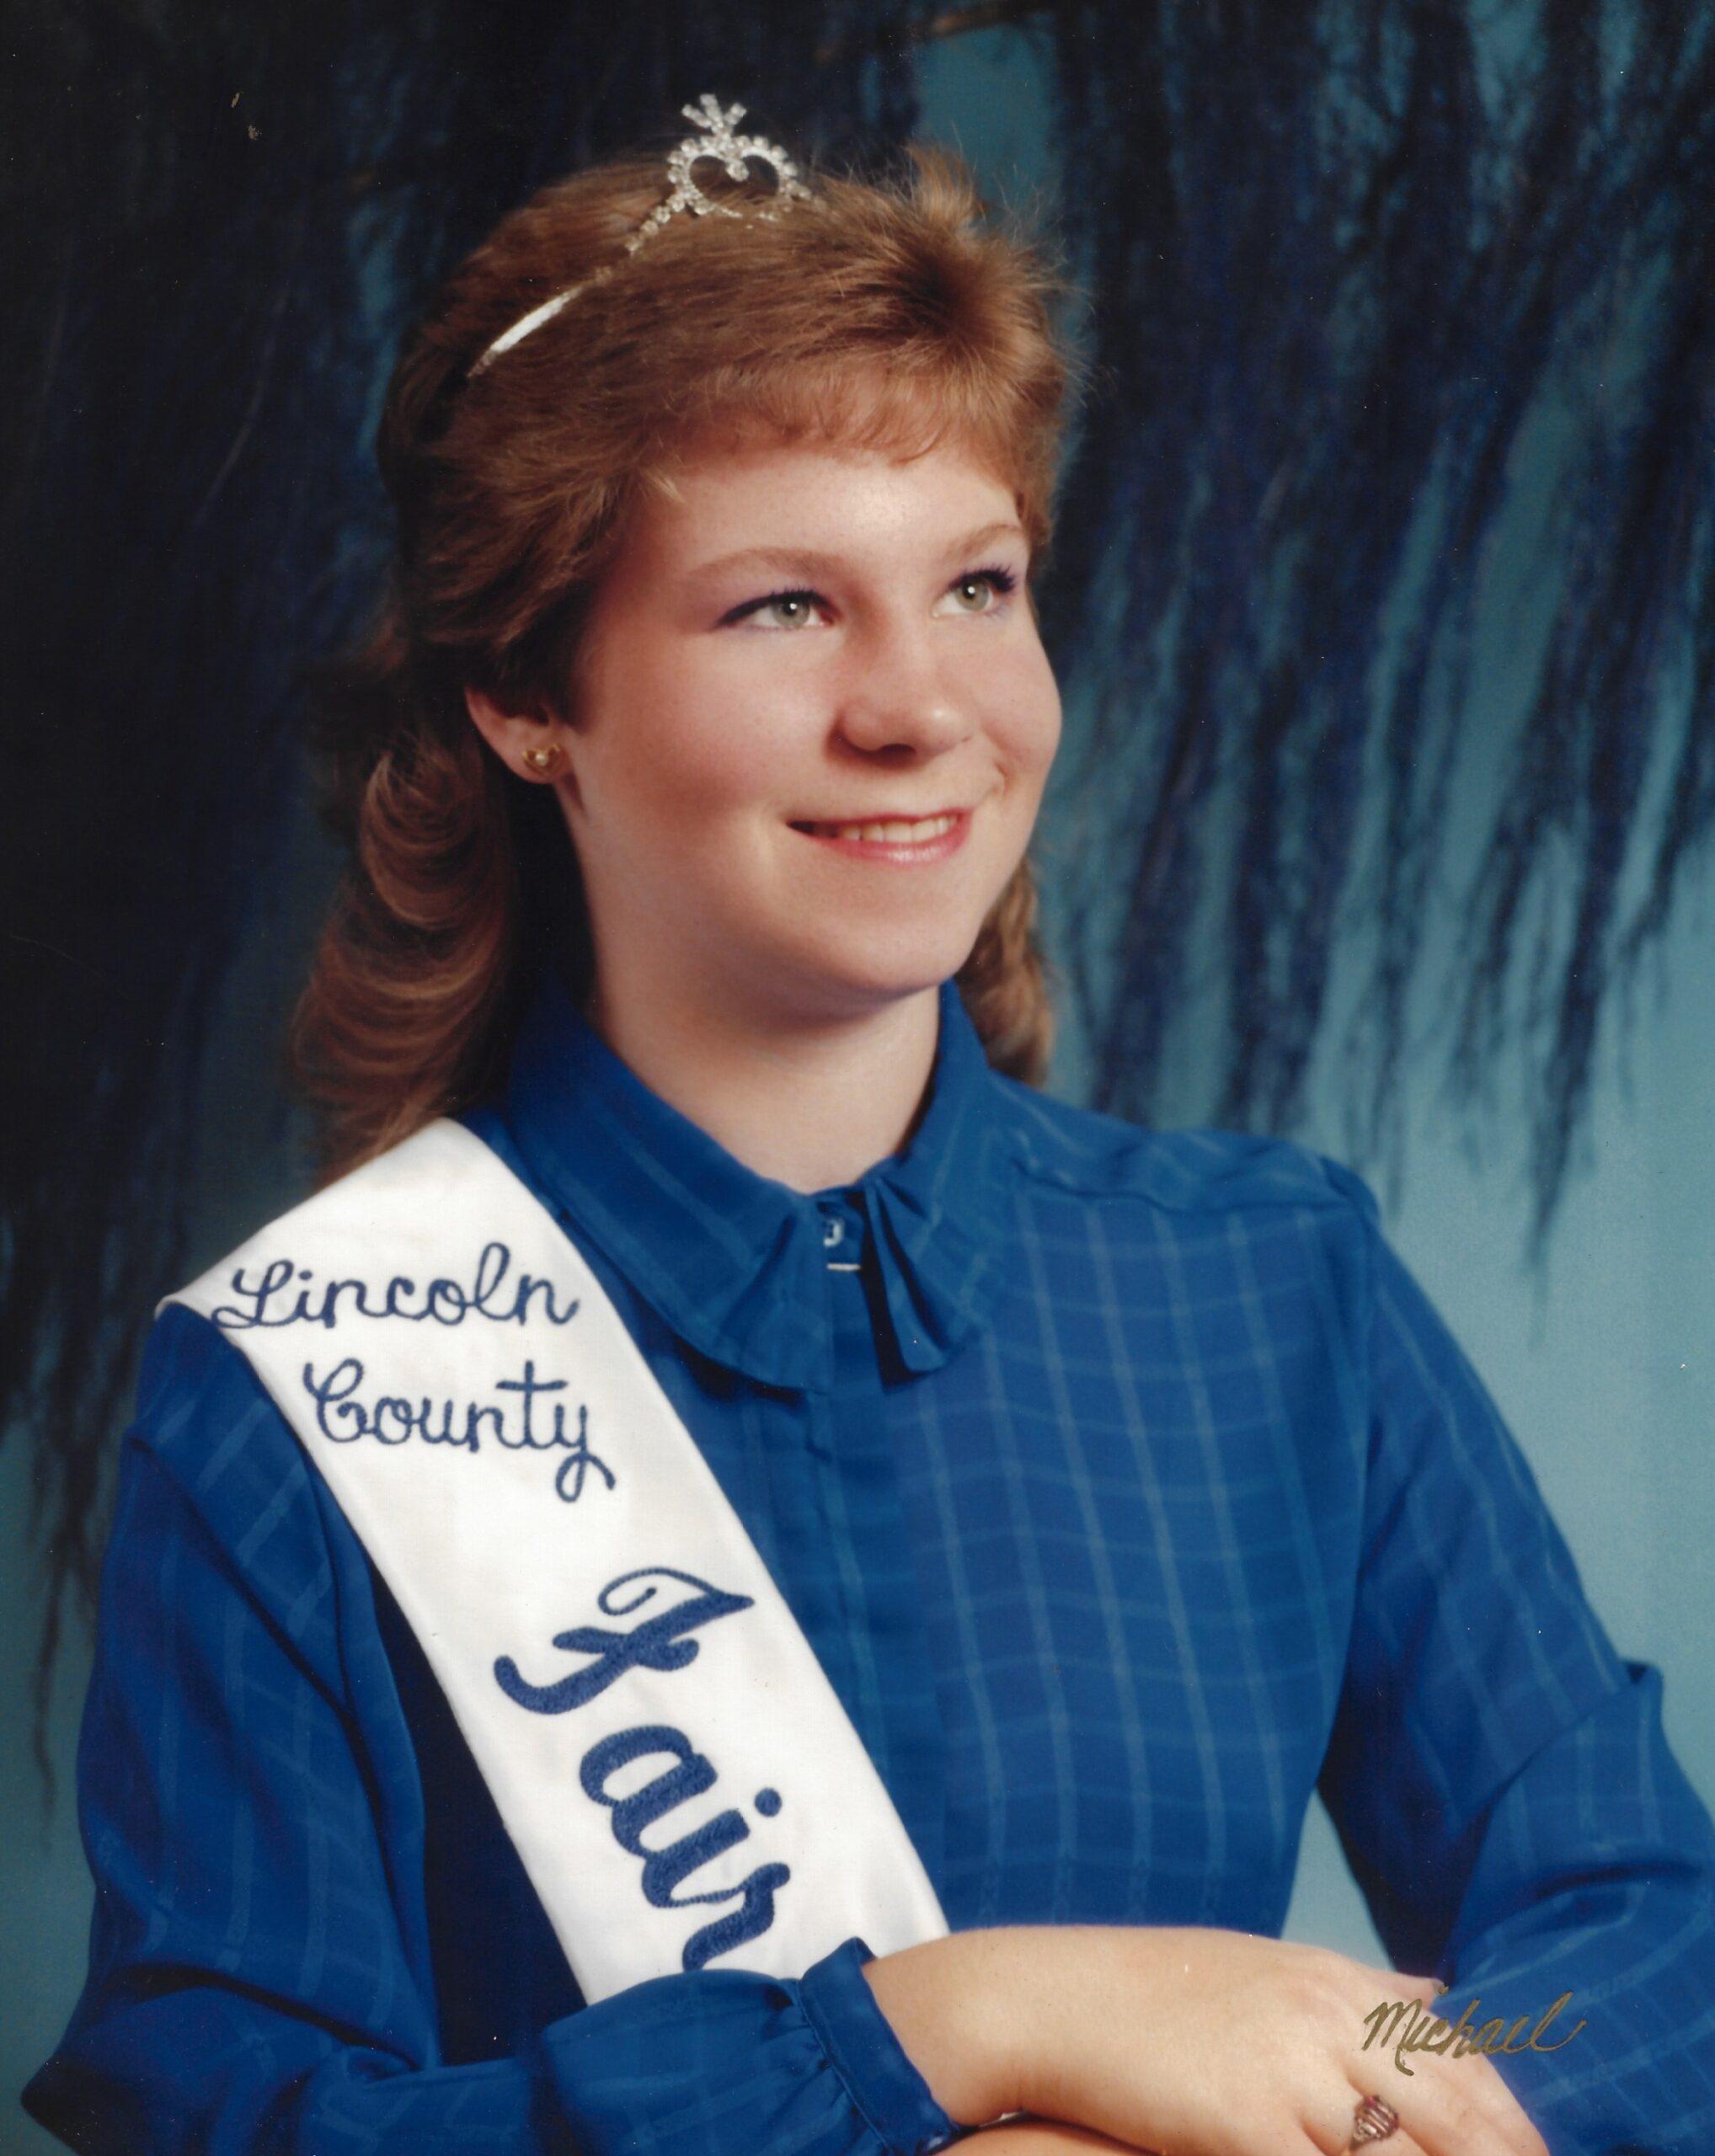 1983 Lincoln County Fair Queen